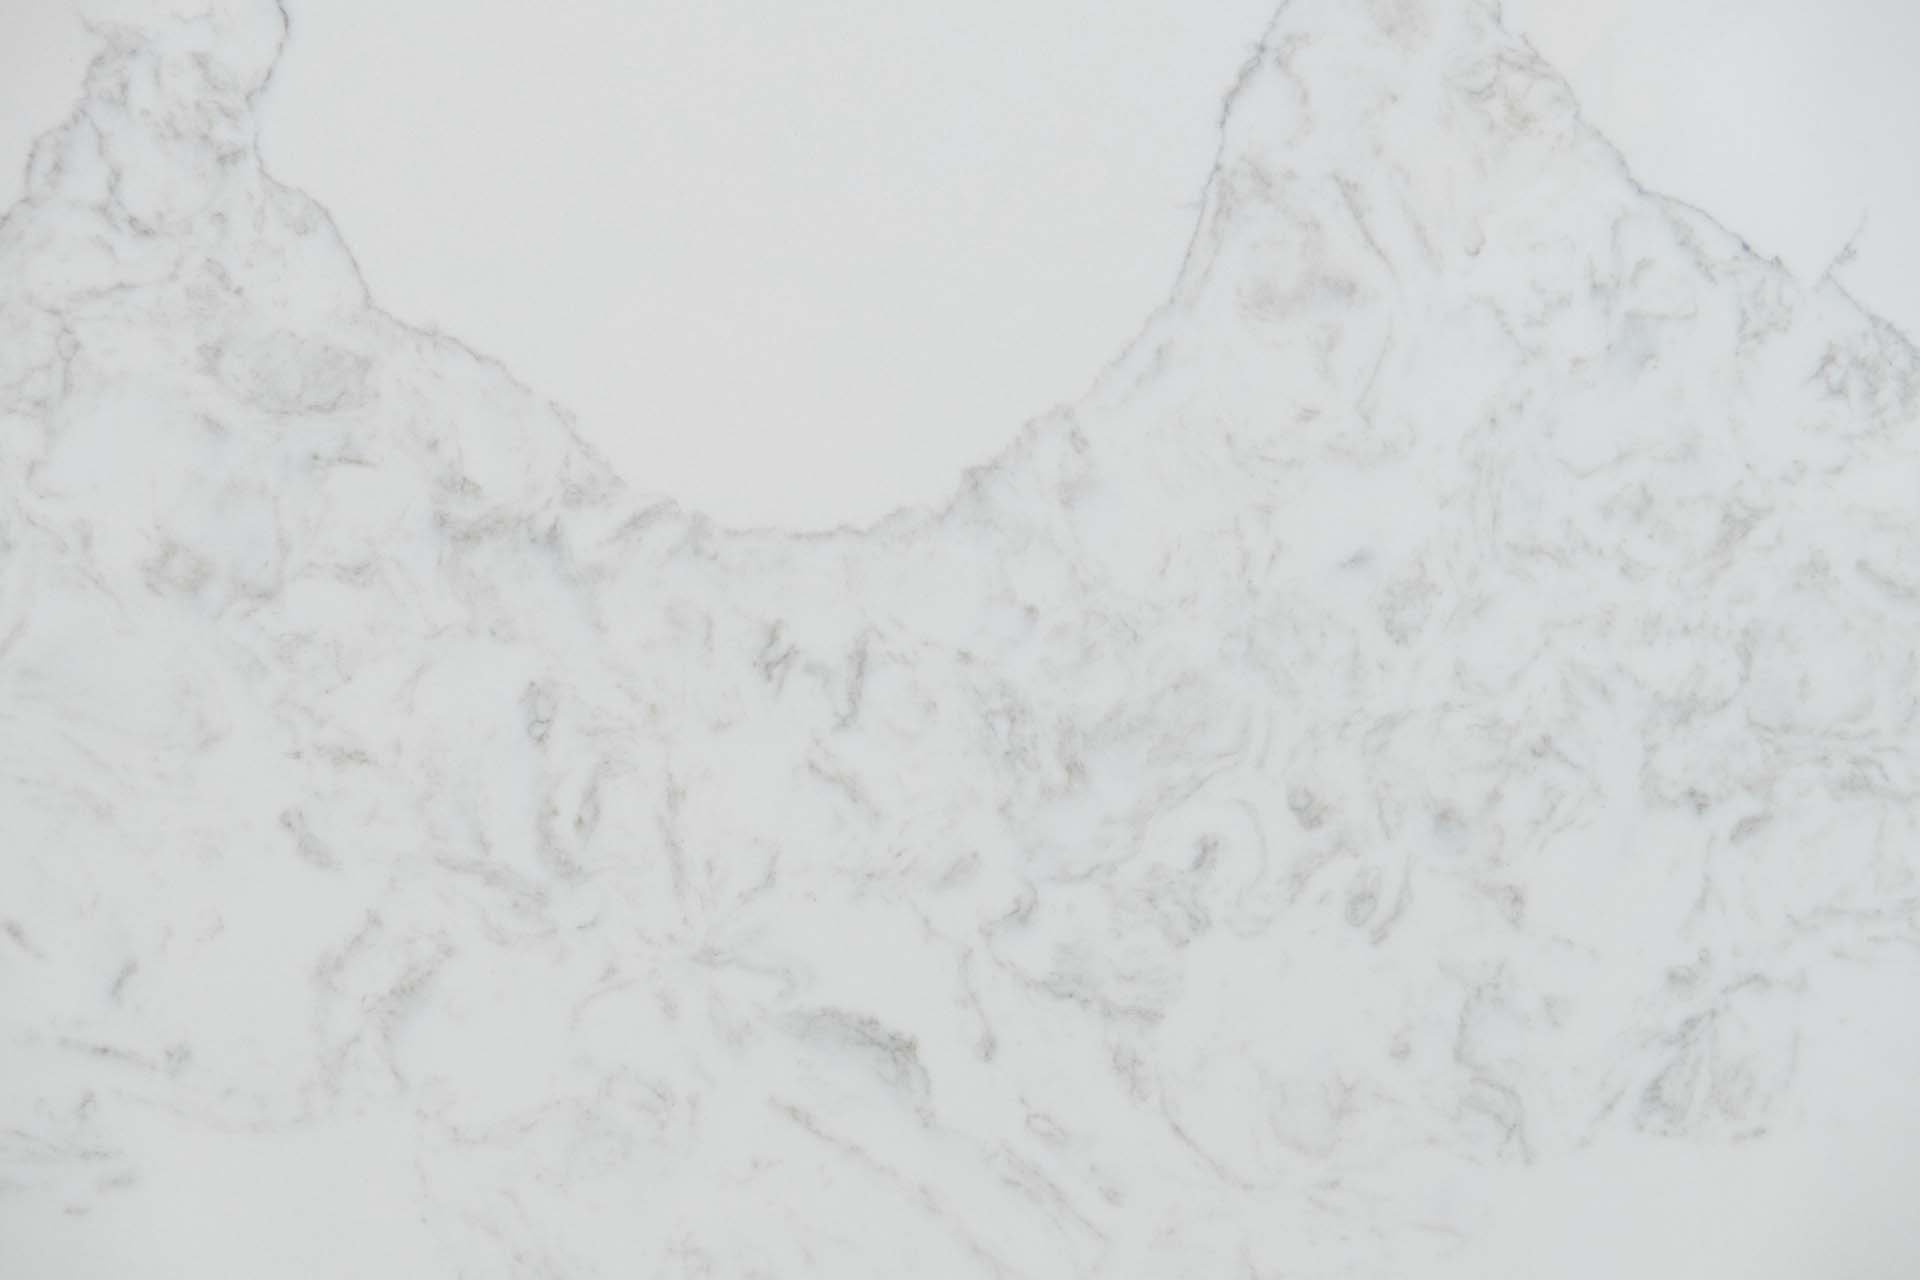 bloomstone everest quartz worktops bs190521 35664 152740a